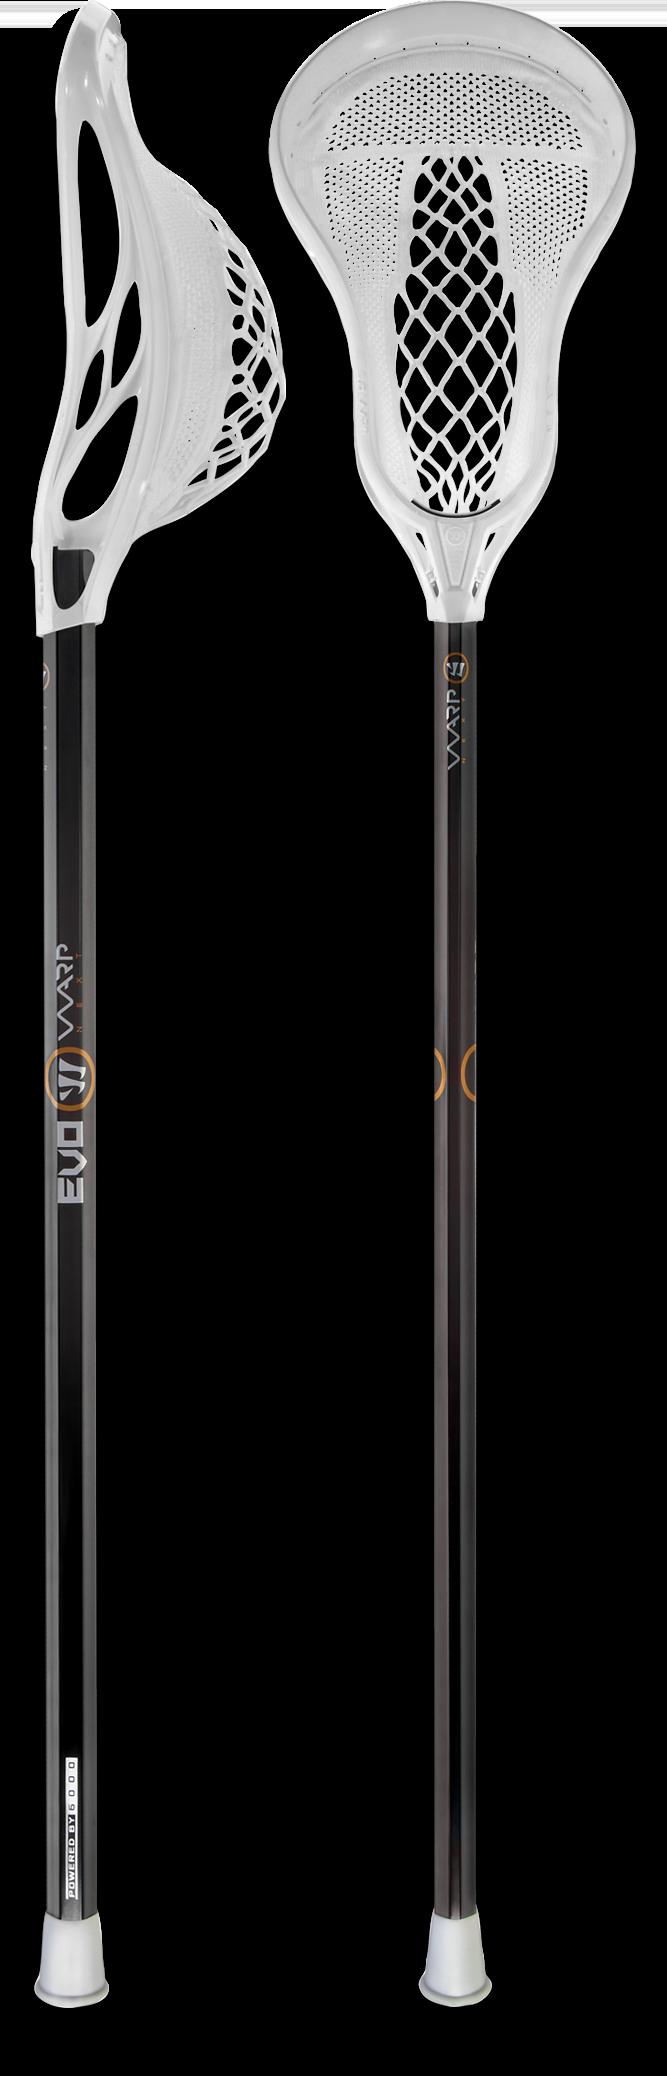 Lacrosse stick, side view